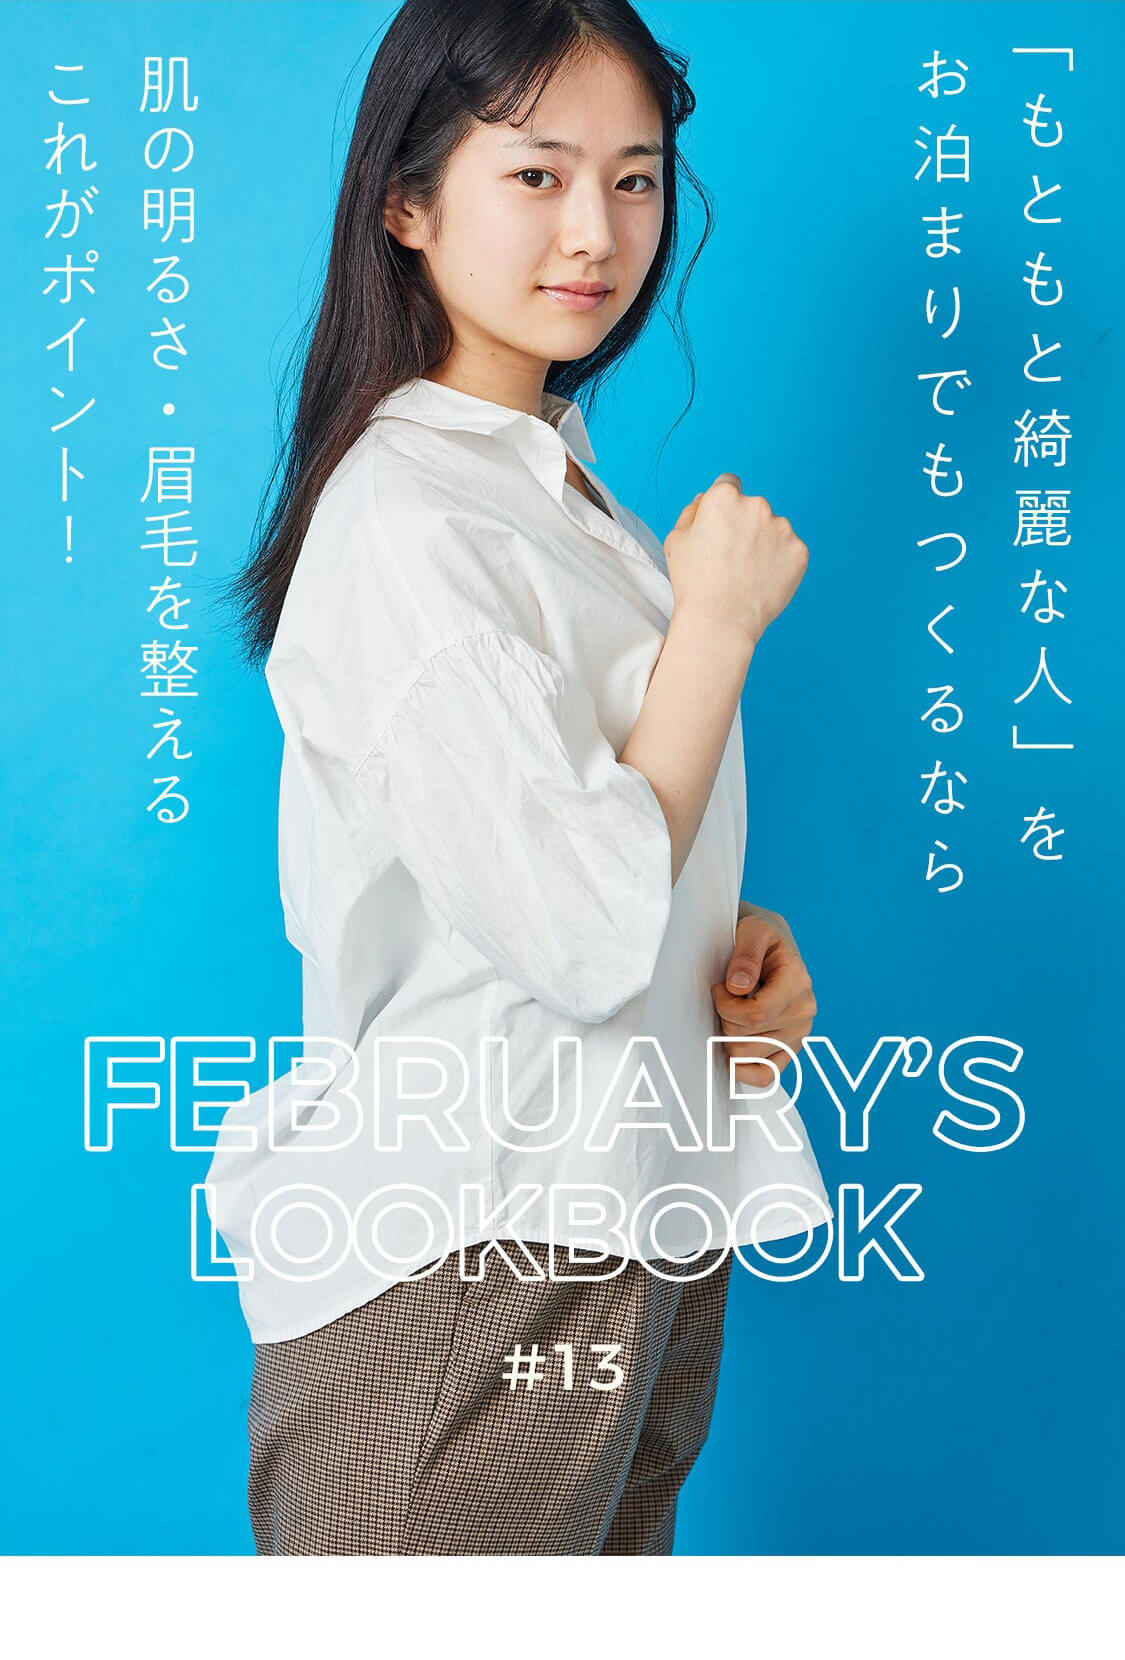 FEBRUARY'S LOOKBOOK vol.13